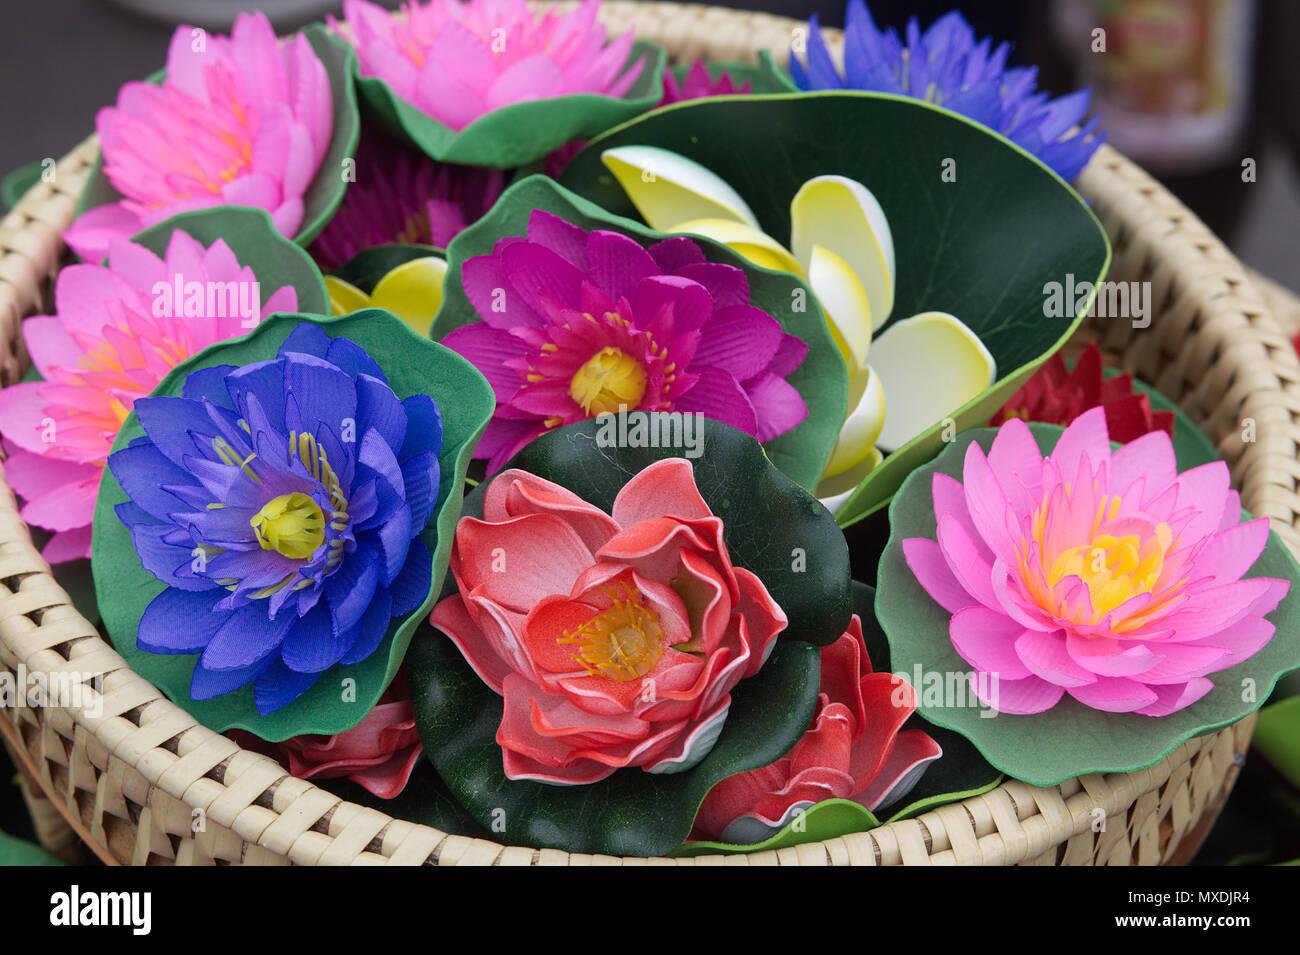 Lotus flower market stock photos lotus flower market stock images decorative silk lotus flowers stock image izmirmasajfo